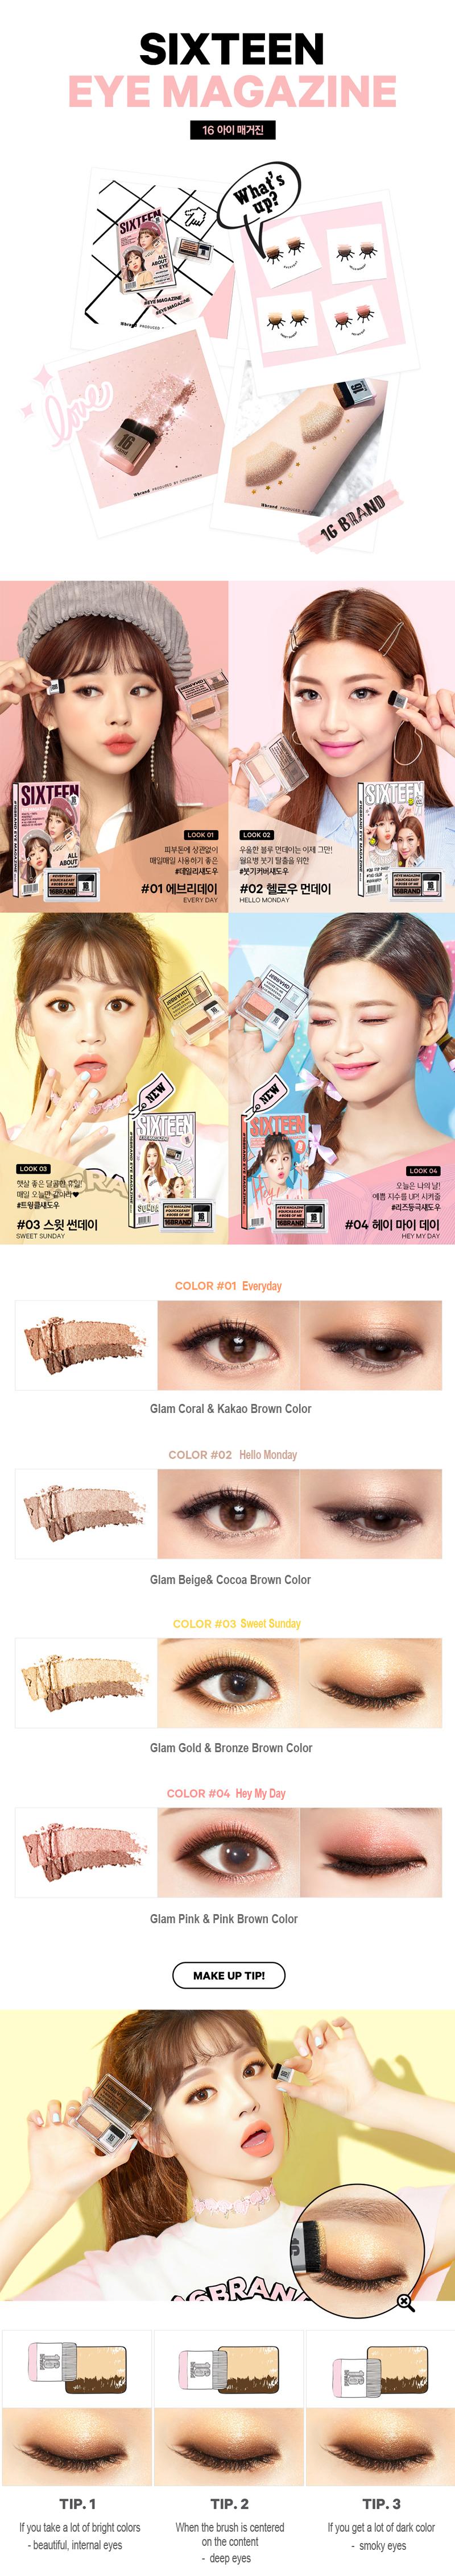 16 BRAND Sixteen Eye Magazine